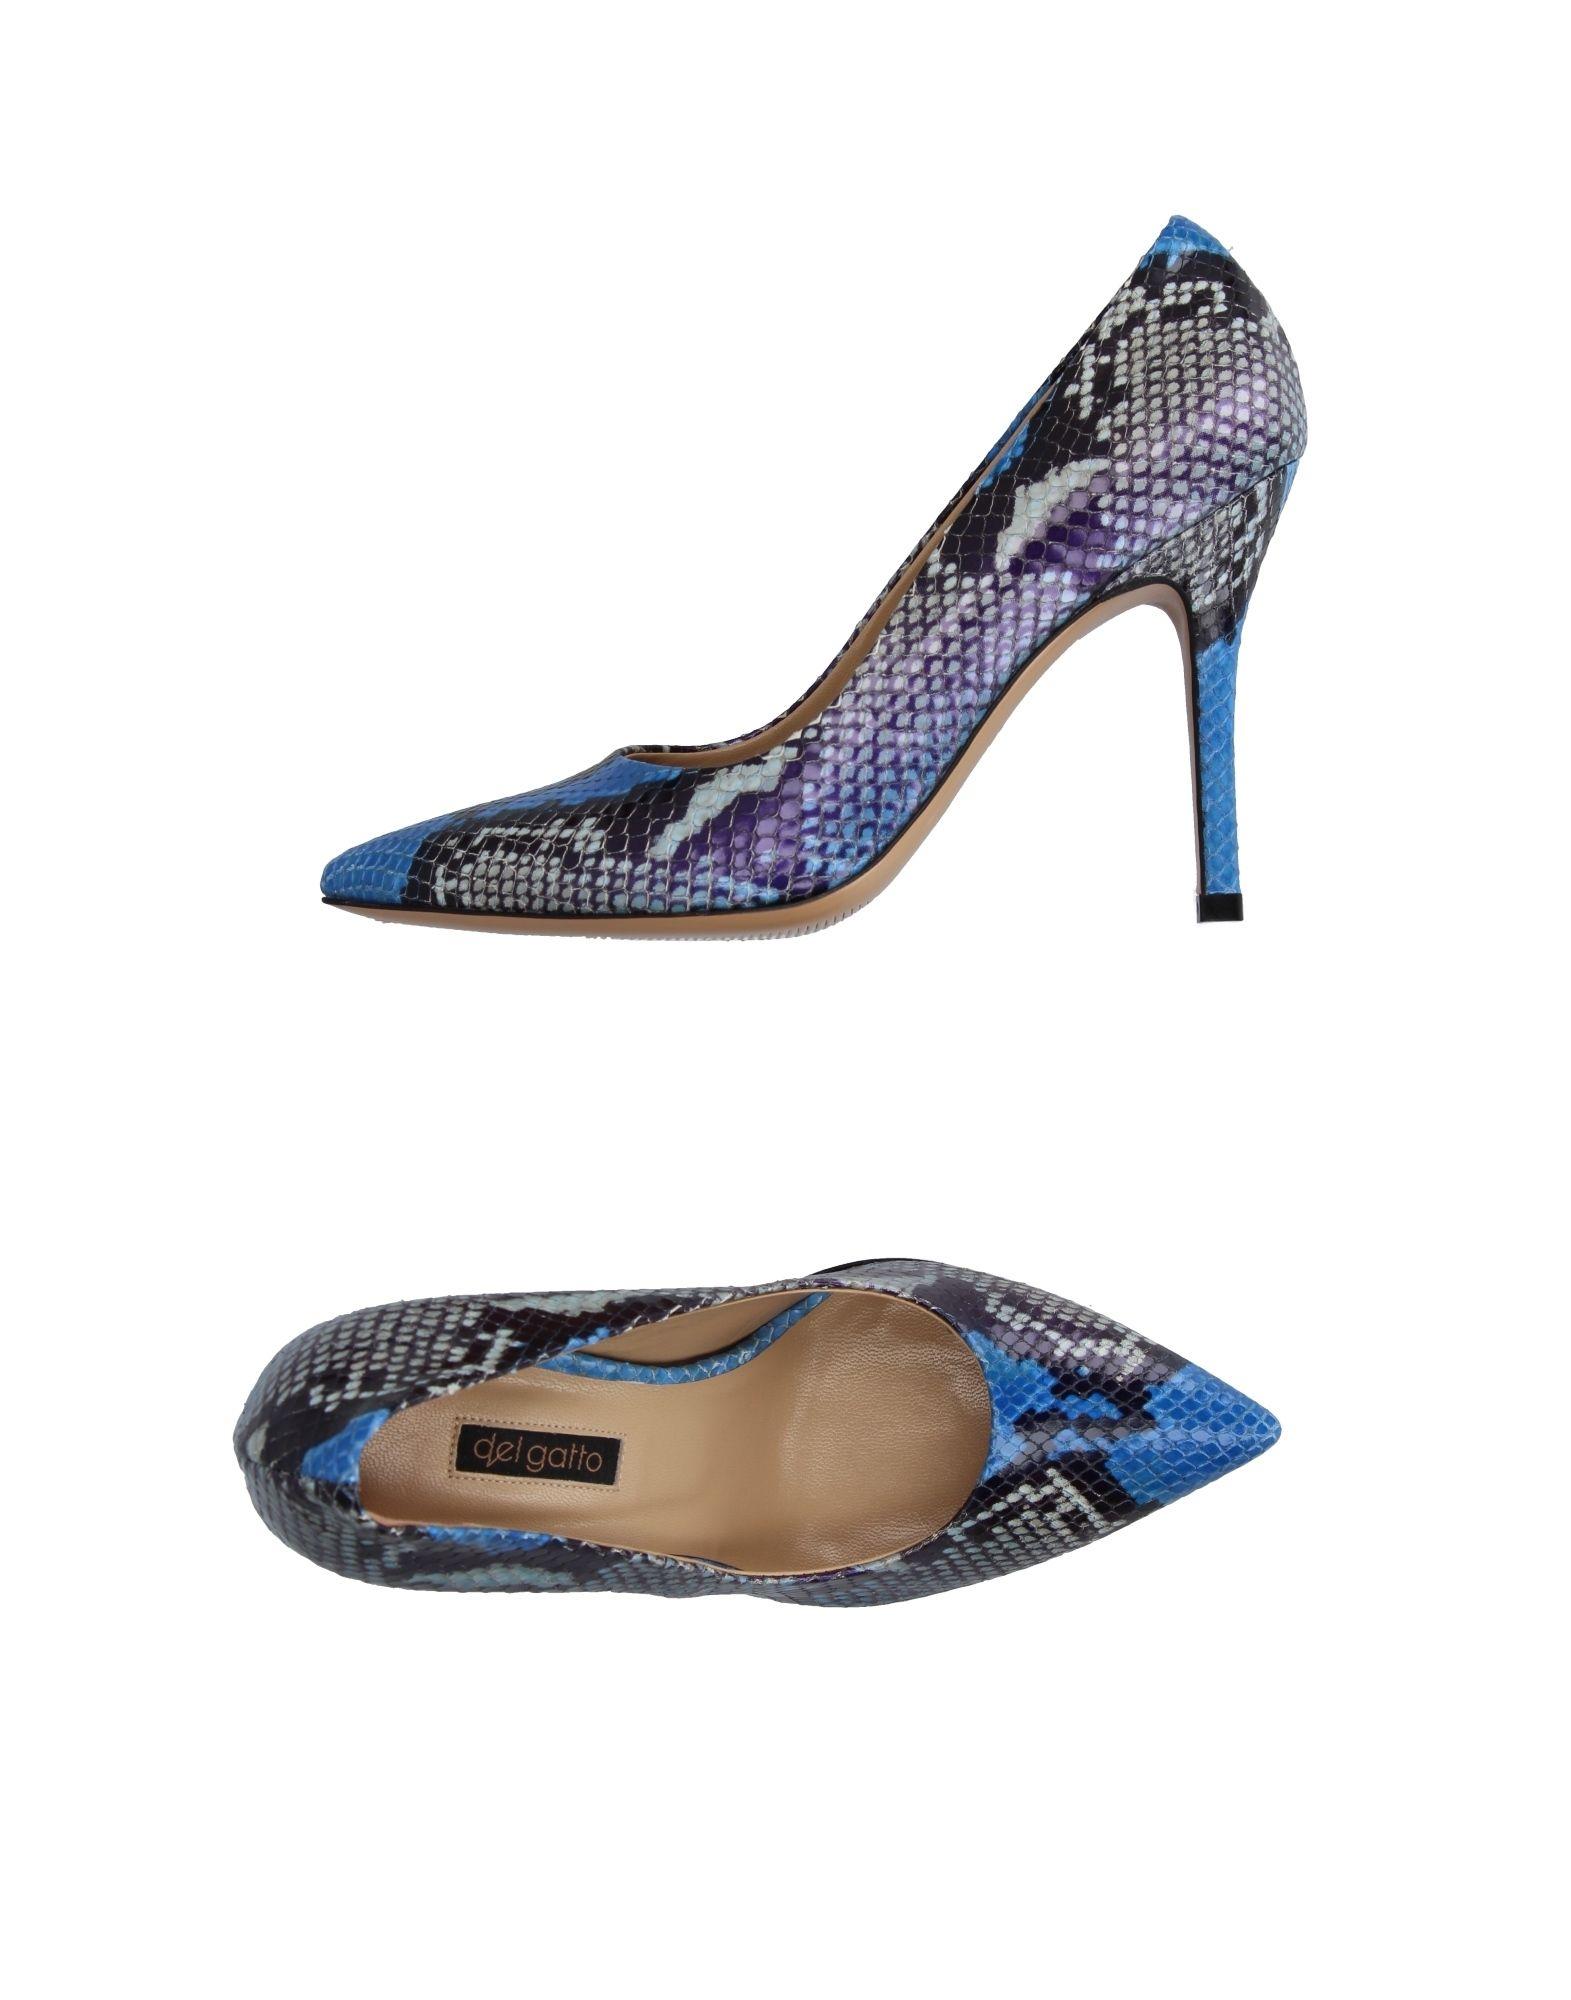 DEL GATTO Туфли del gatto полусапоги и высокие ботинки